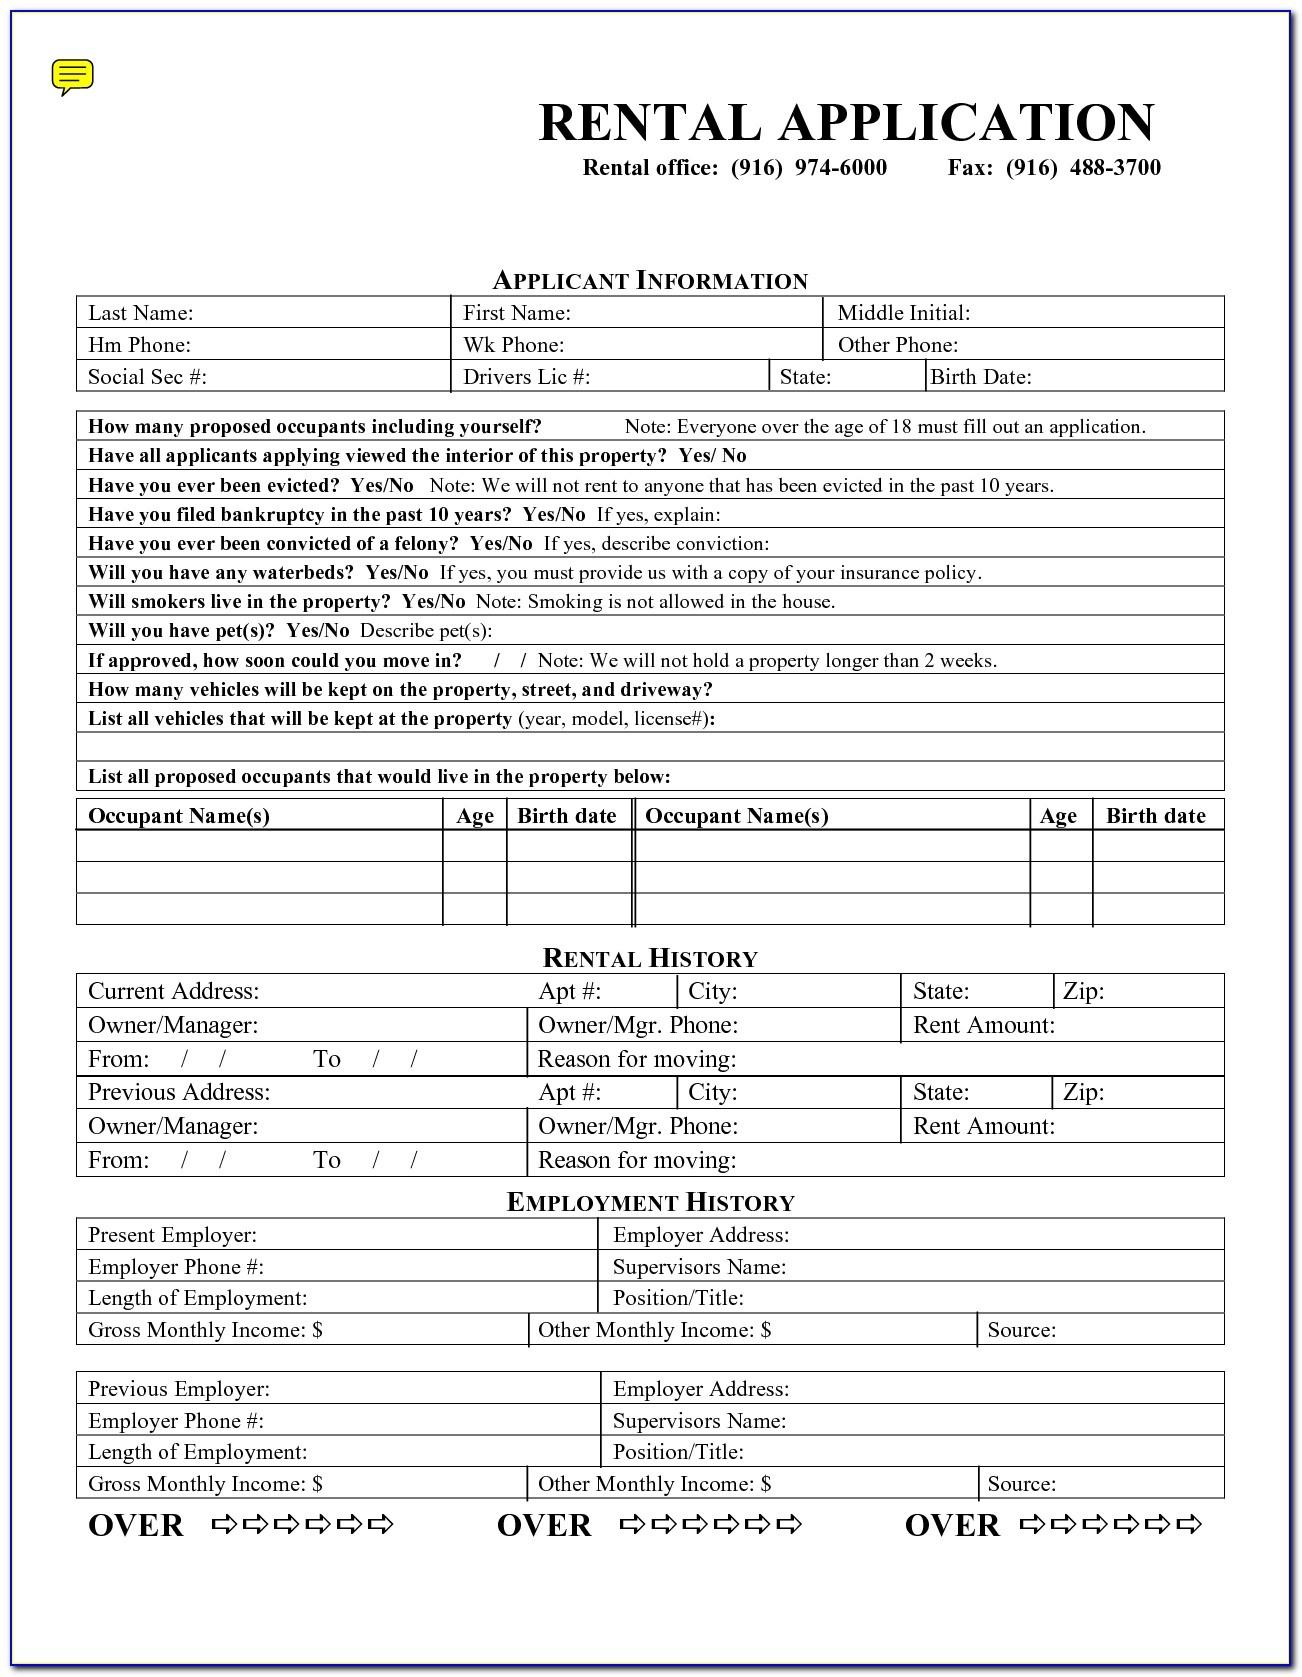 Rental Application Forms Free Printable - Form : Resume Examples - Free Printable Rental Application Form